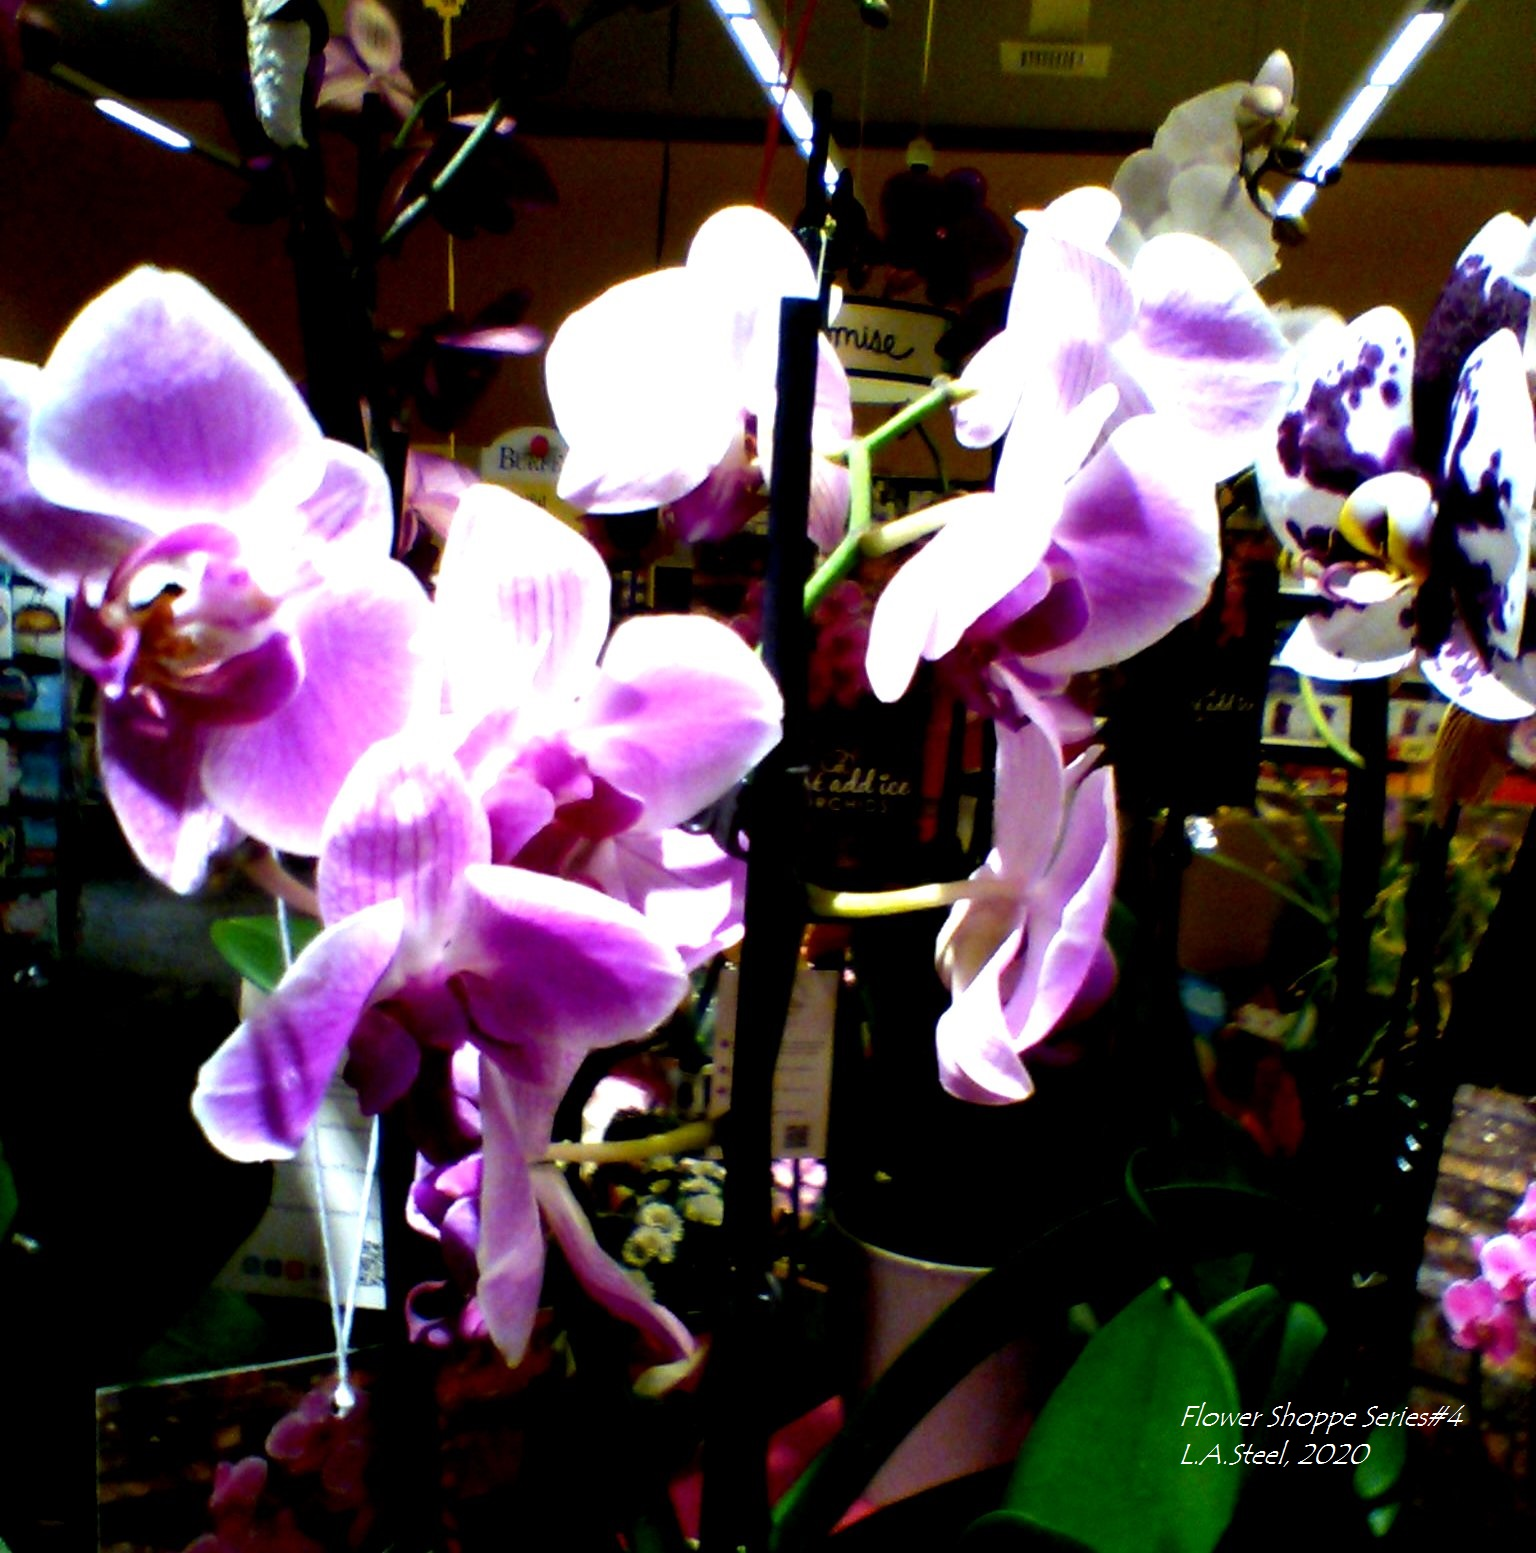 flower shoppe series 4 #6 2020